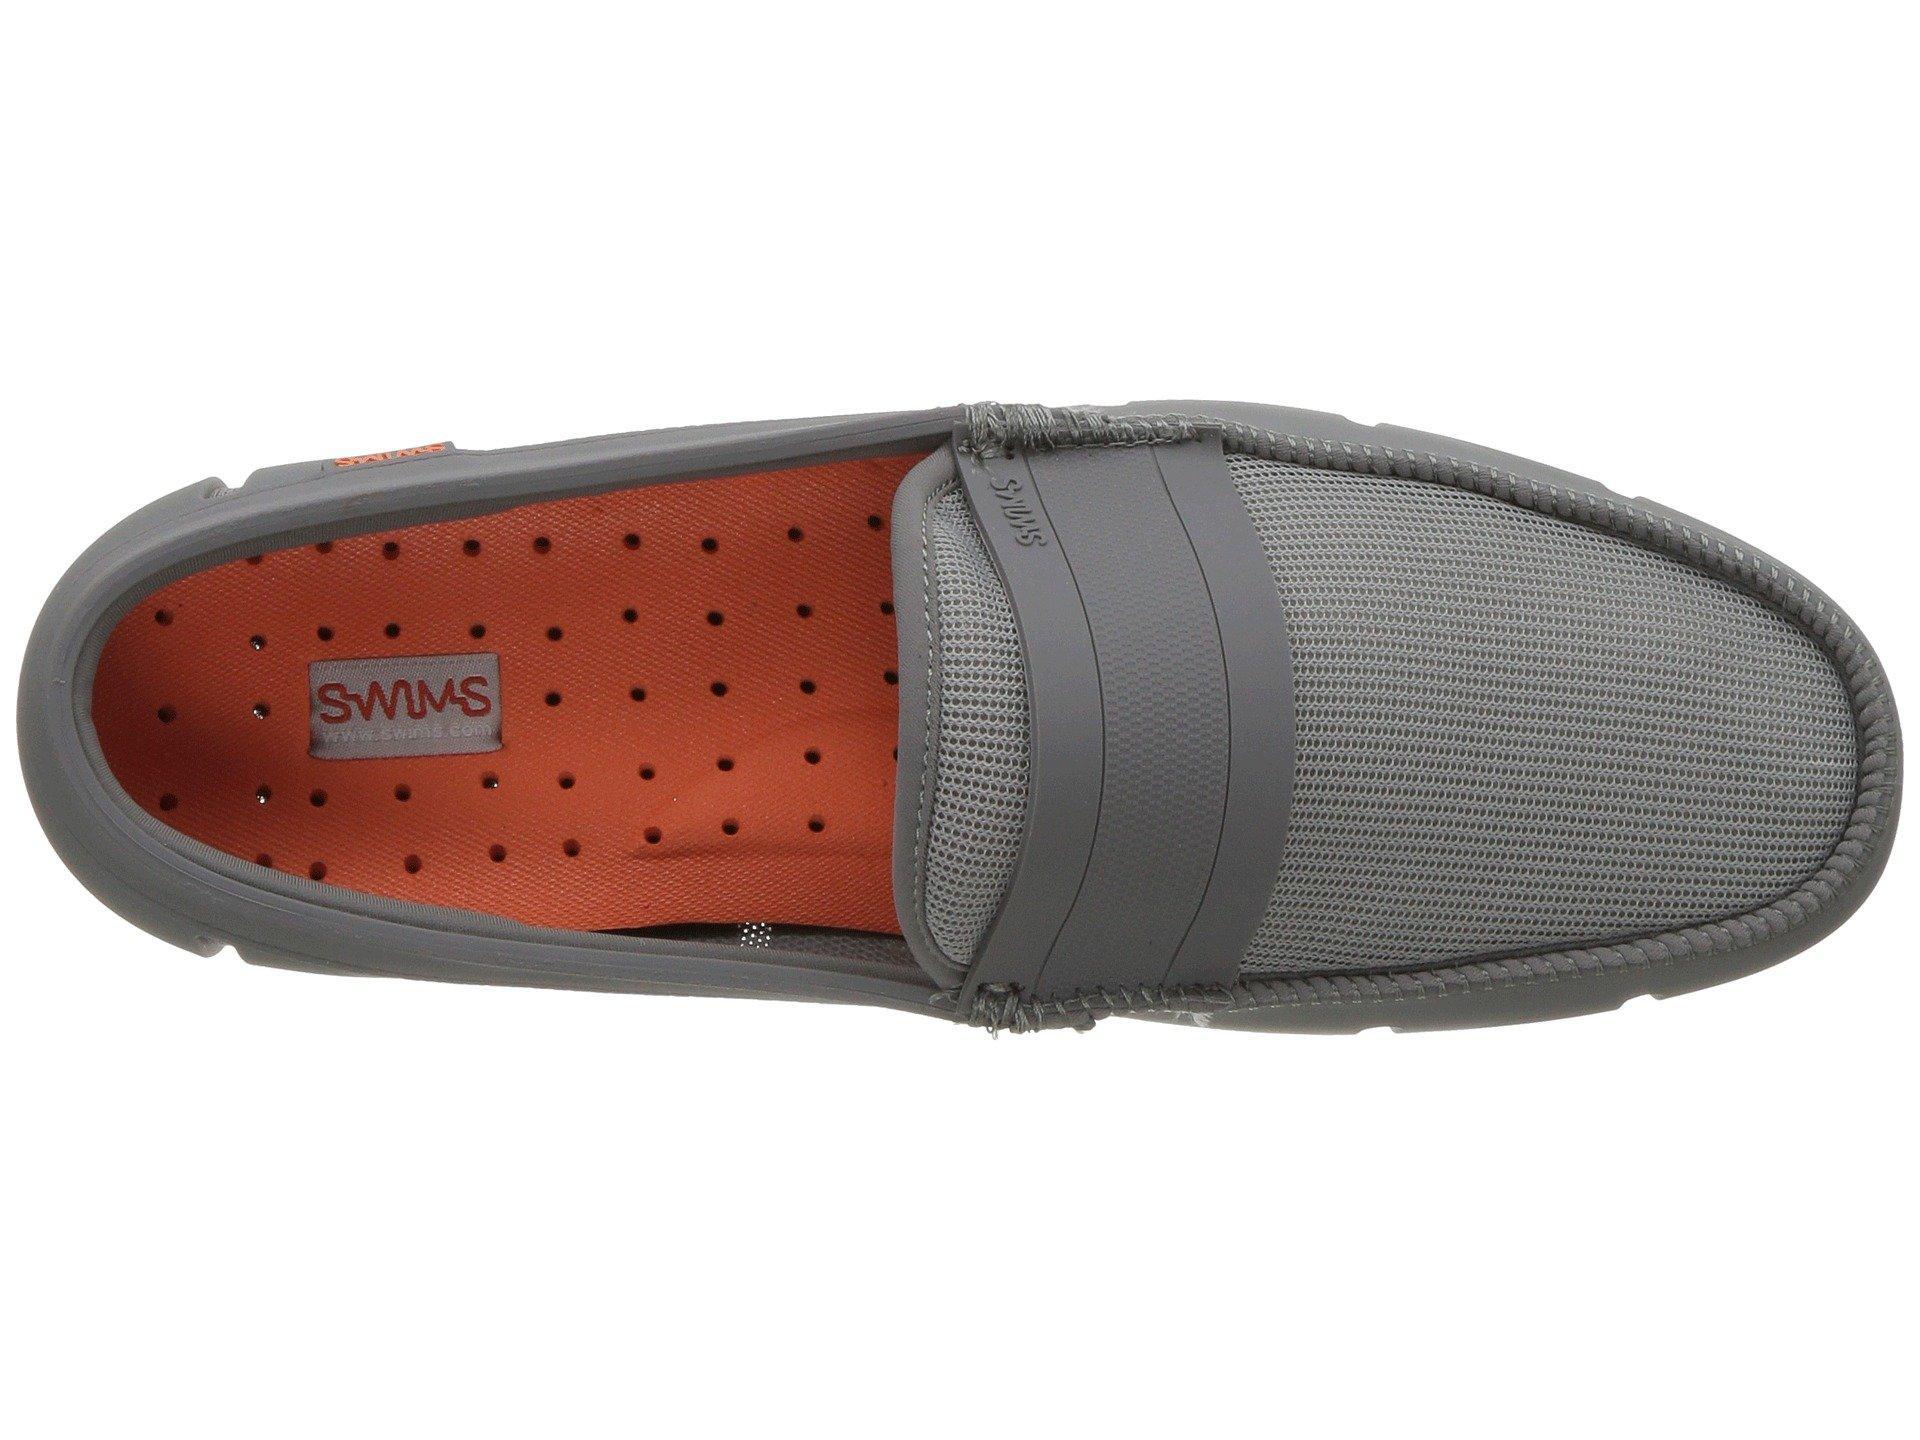 2bdd4b7c35b Swims - Gray Stride Single Band Keeper (seaport Blue alloy) Men s Shoes  for. View fullscreen